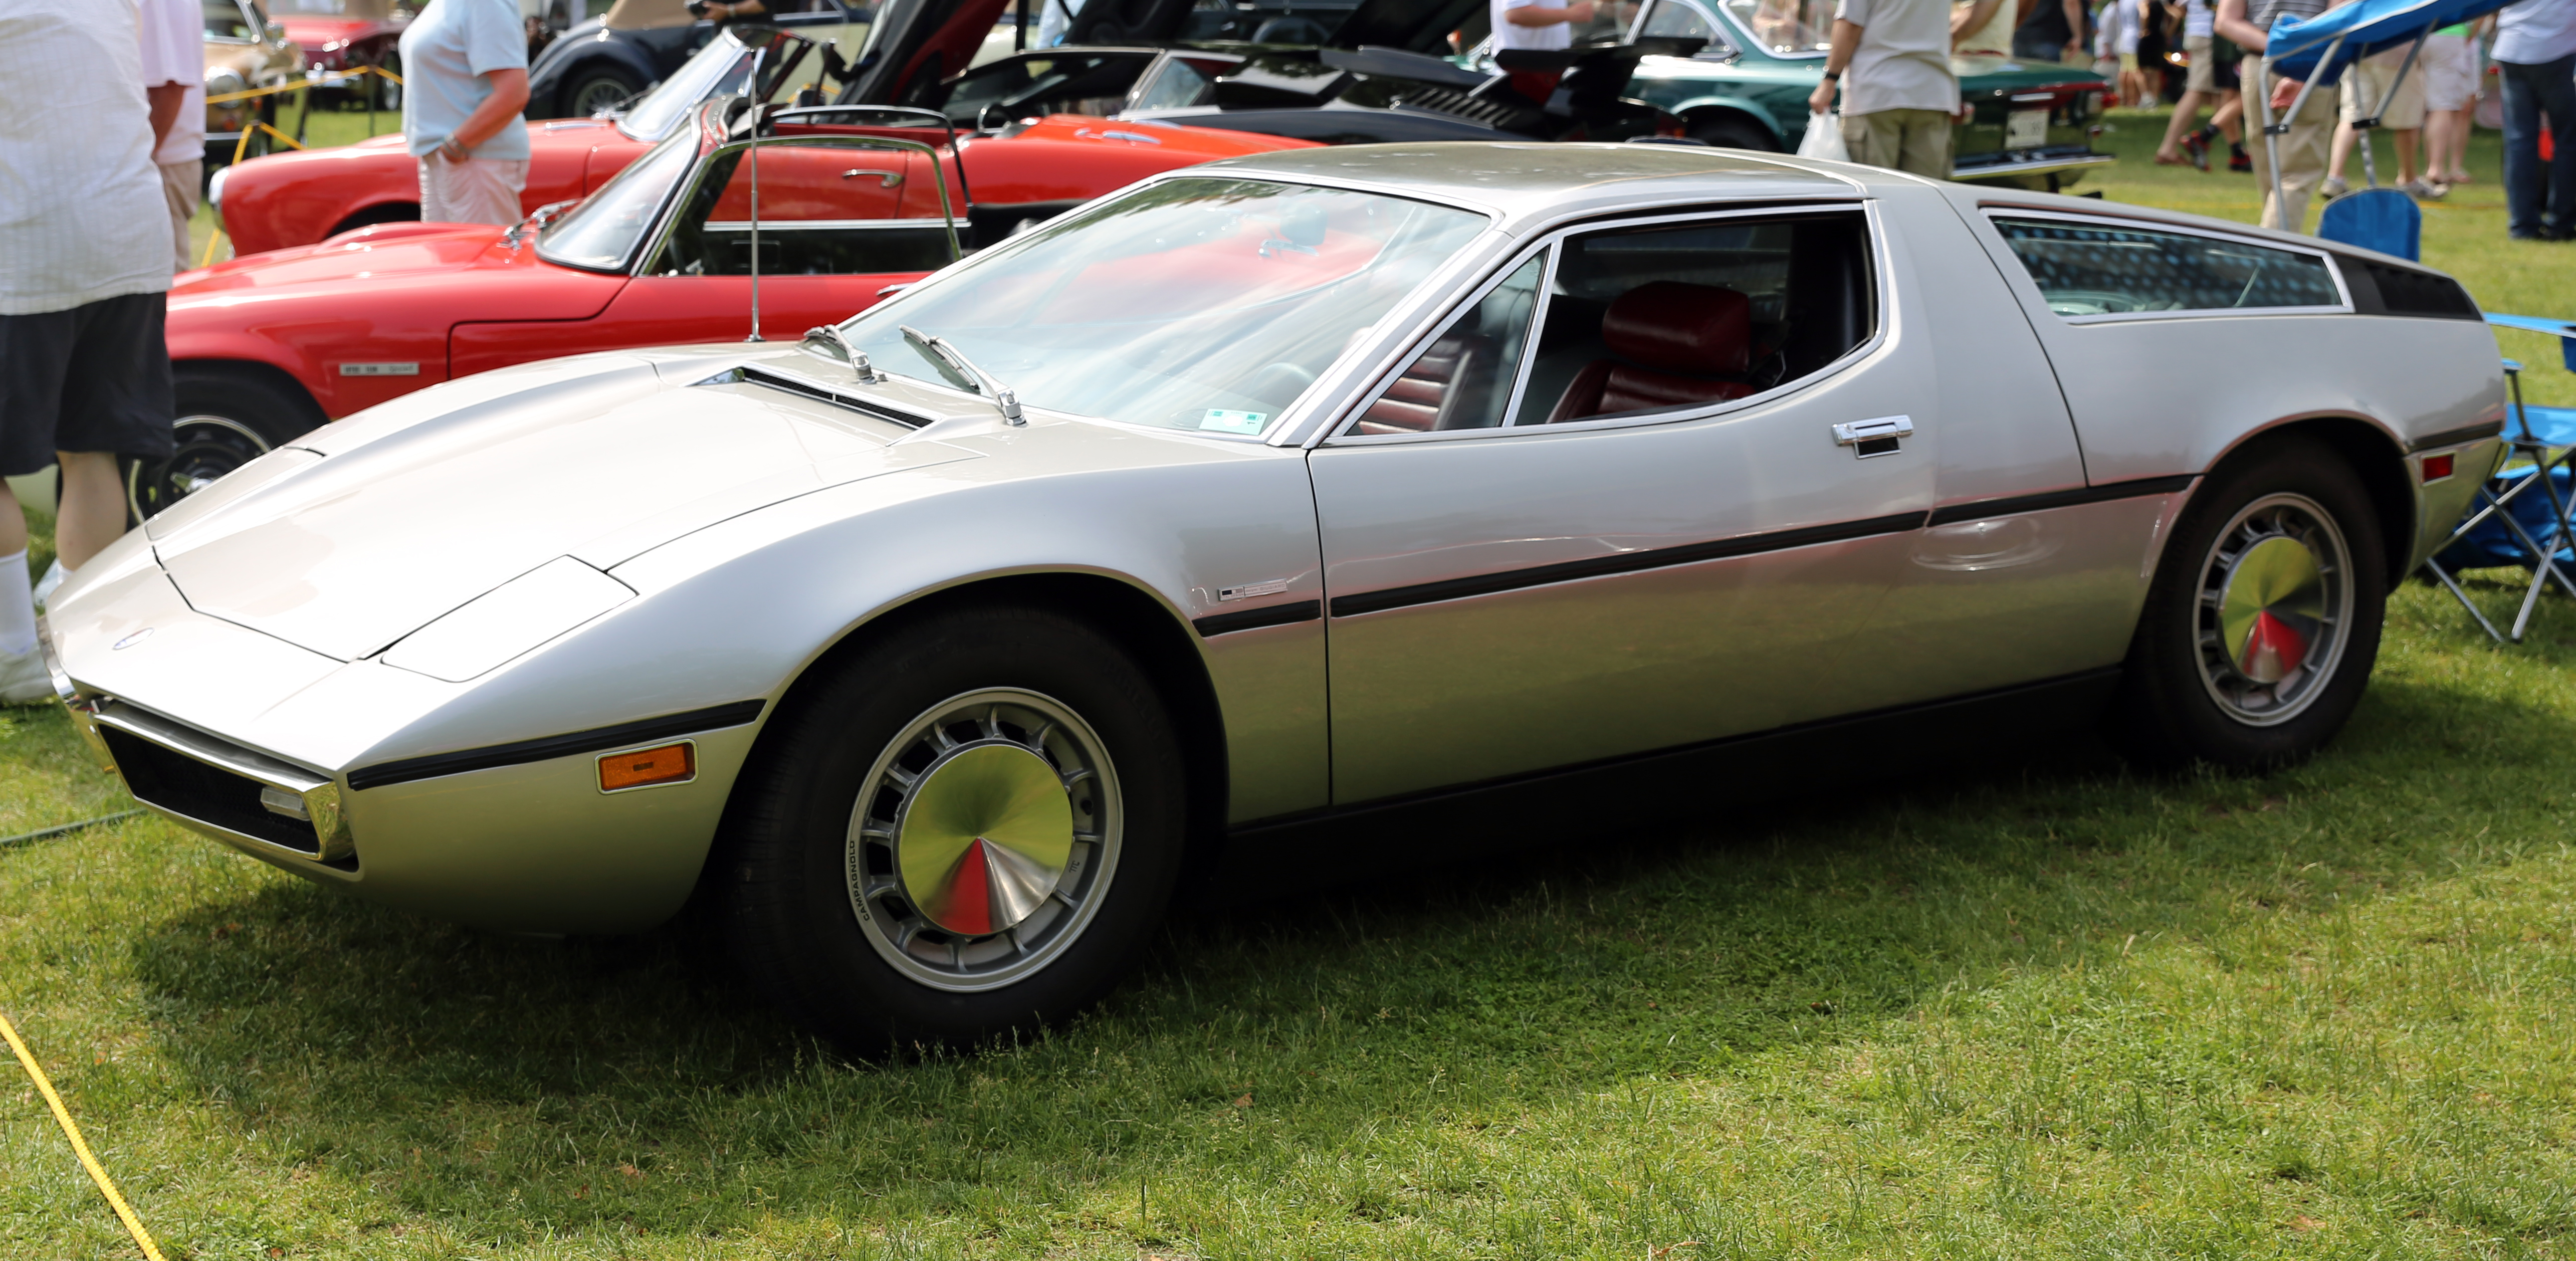 File:1973 Maserati Bora in Greenwich.jpg - Wikimedia Commons